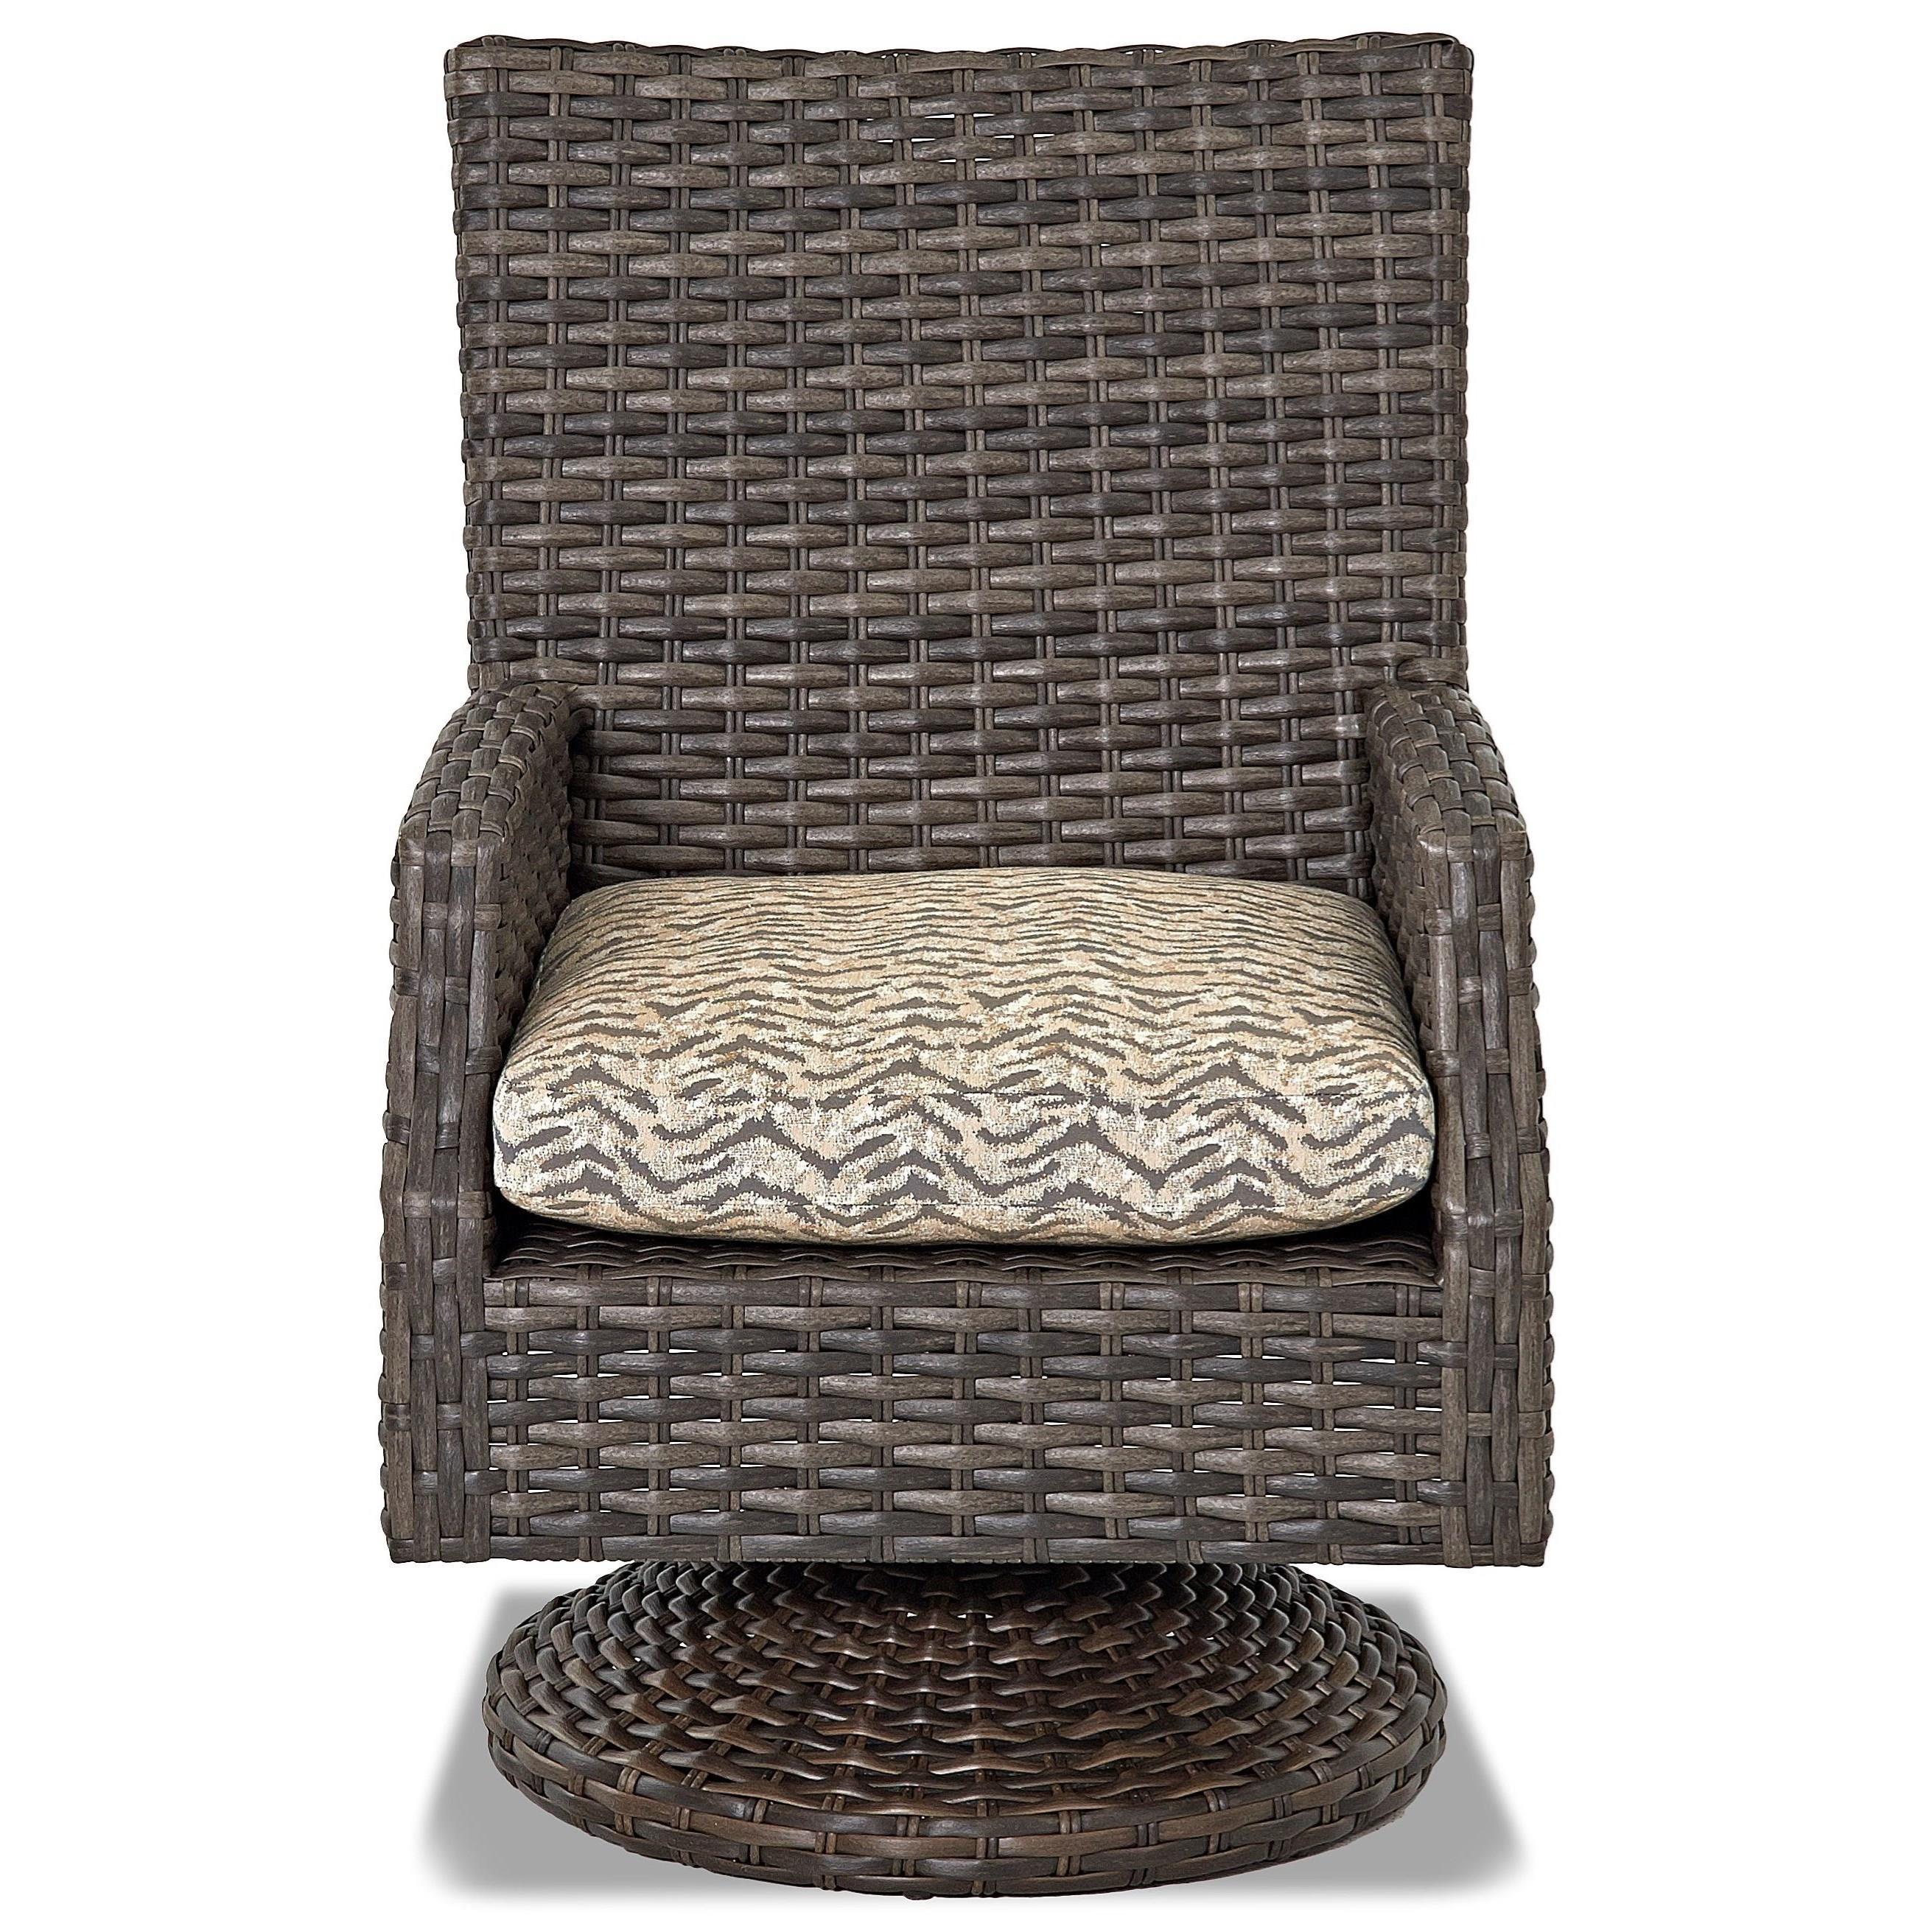 Sw Rock Din Chair w/ Drainable Cushion